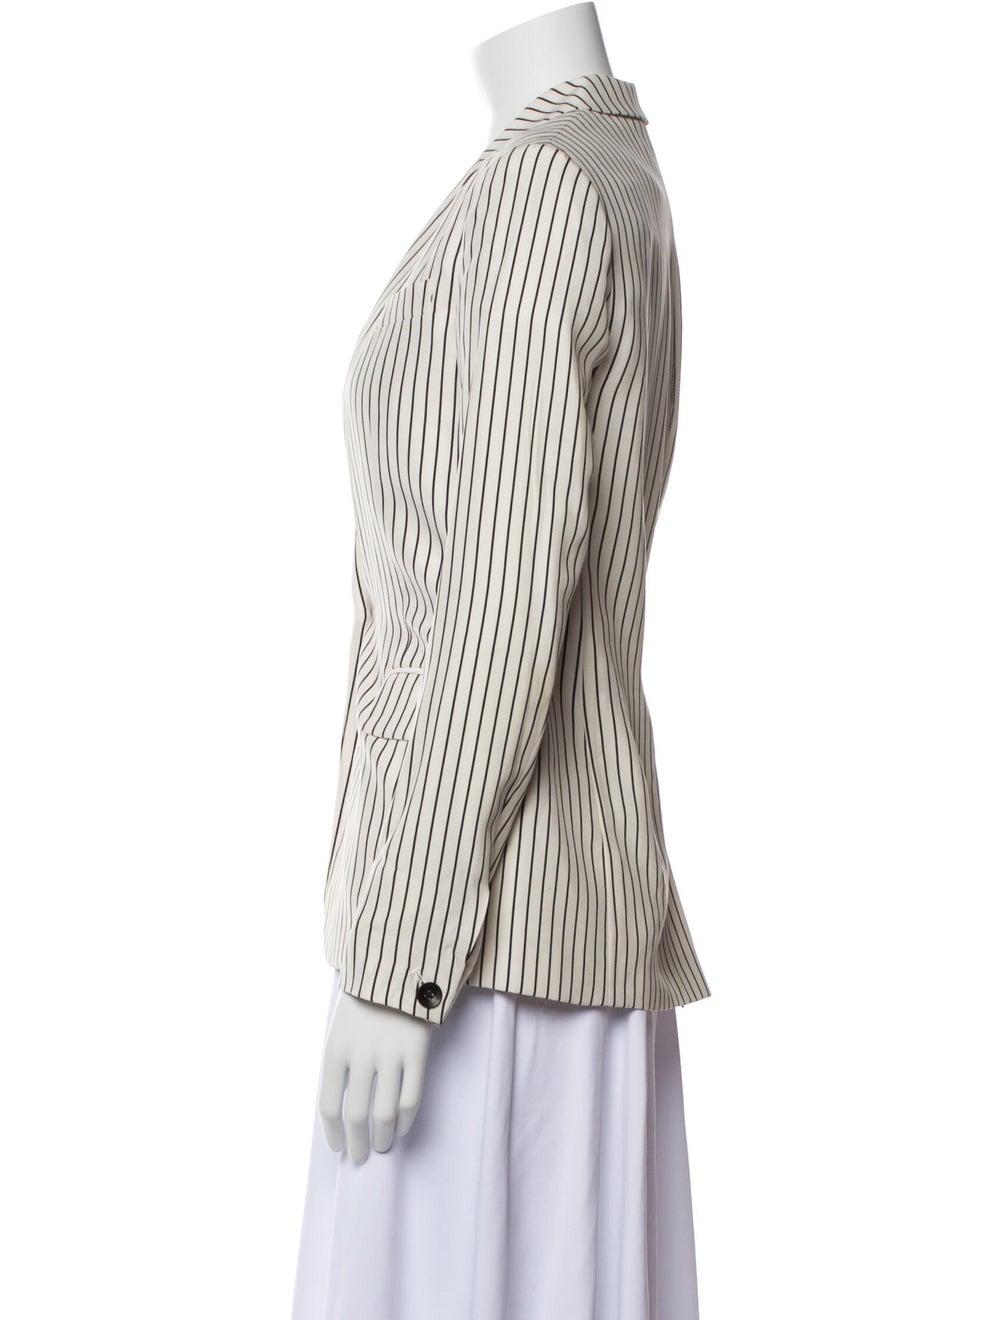 Rag & Bone Silk Striped Blazer - image 2